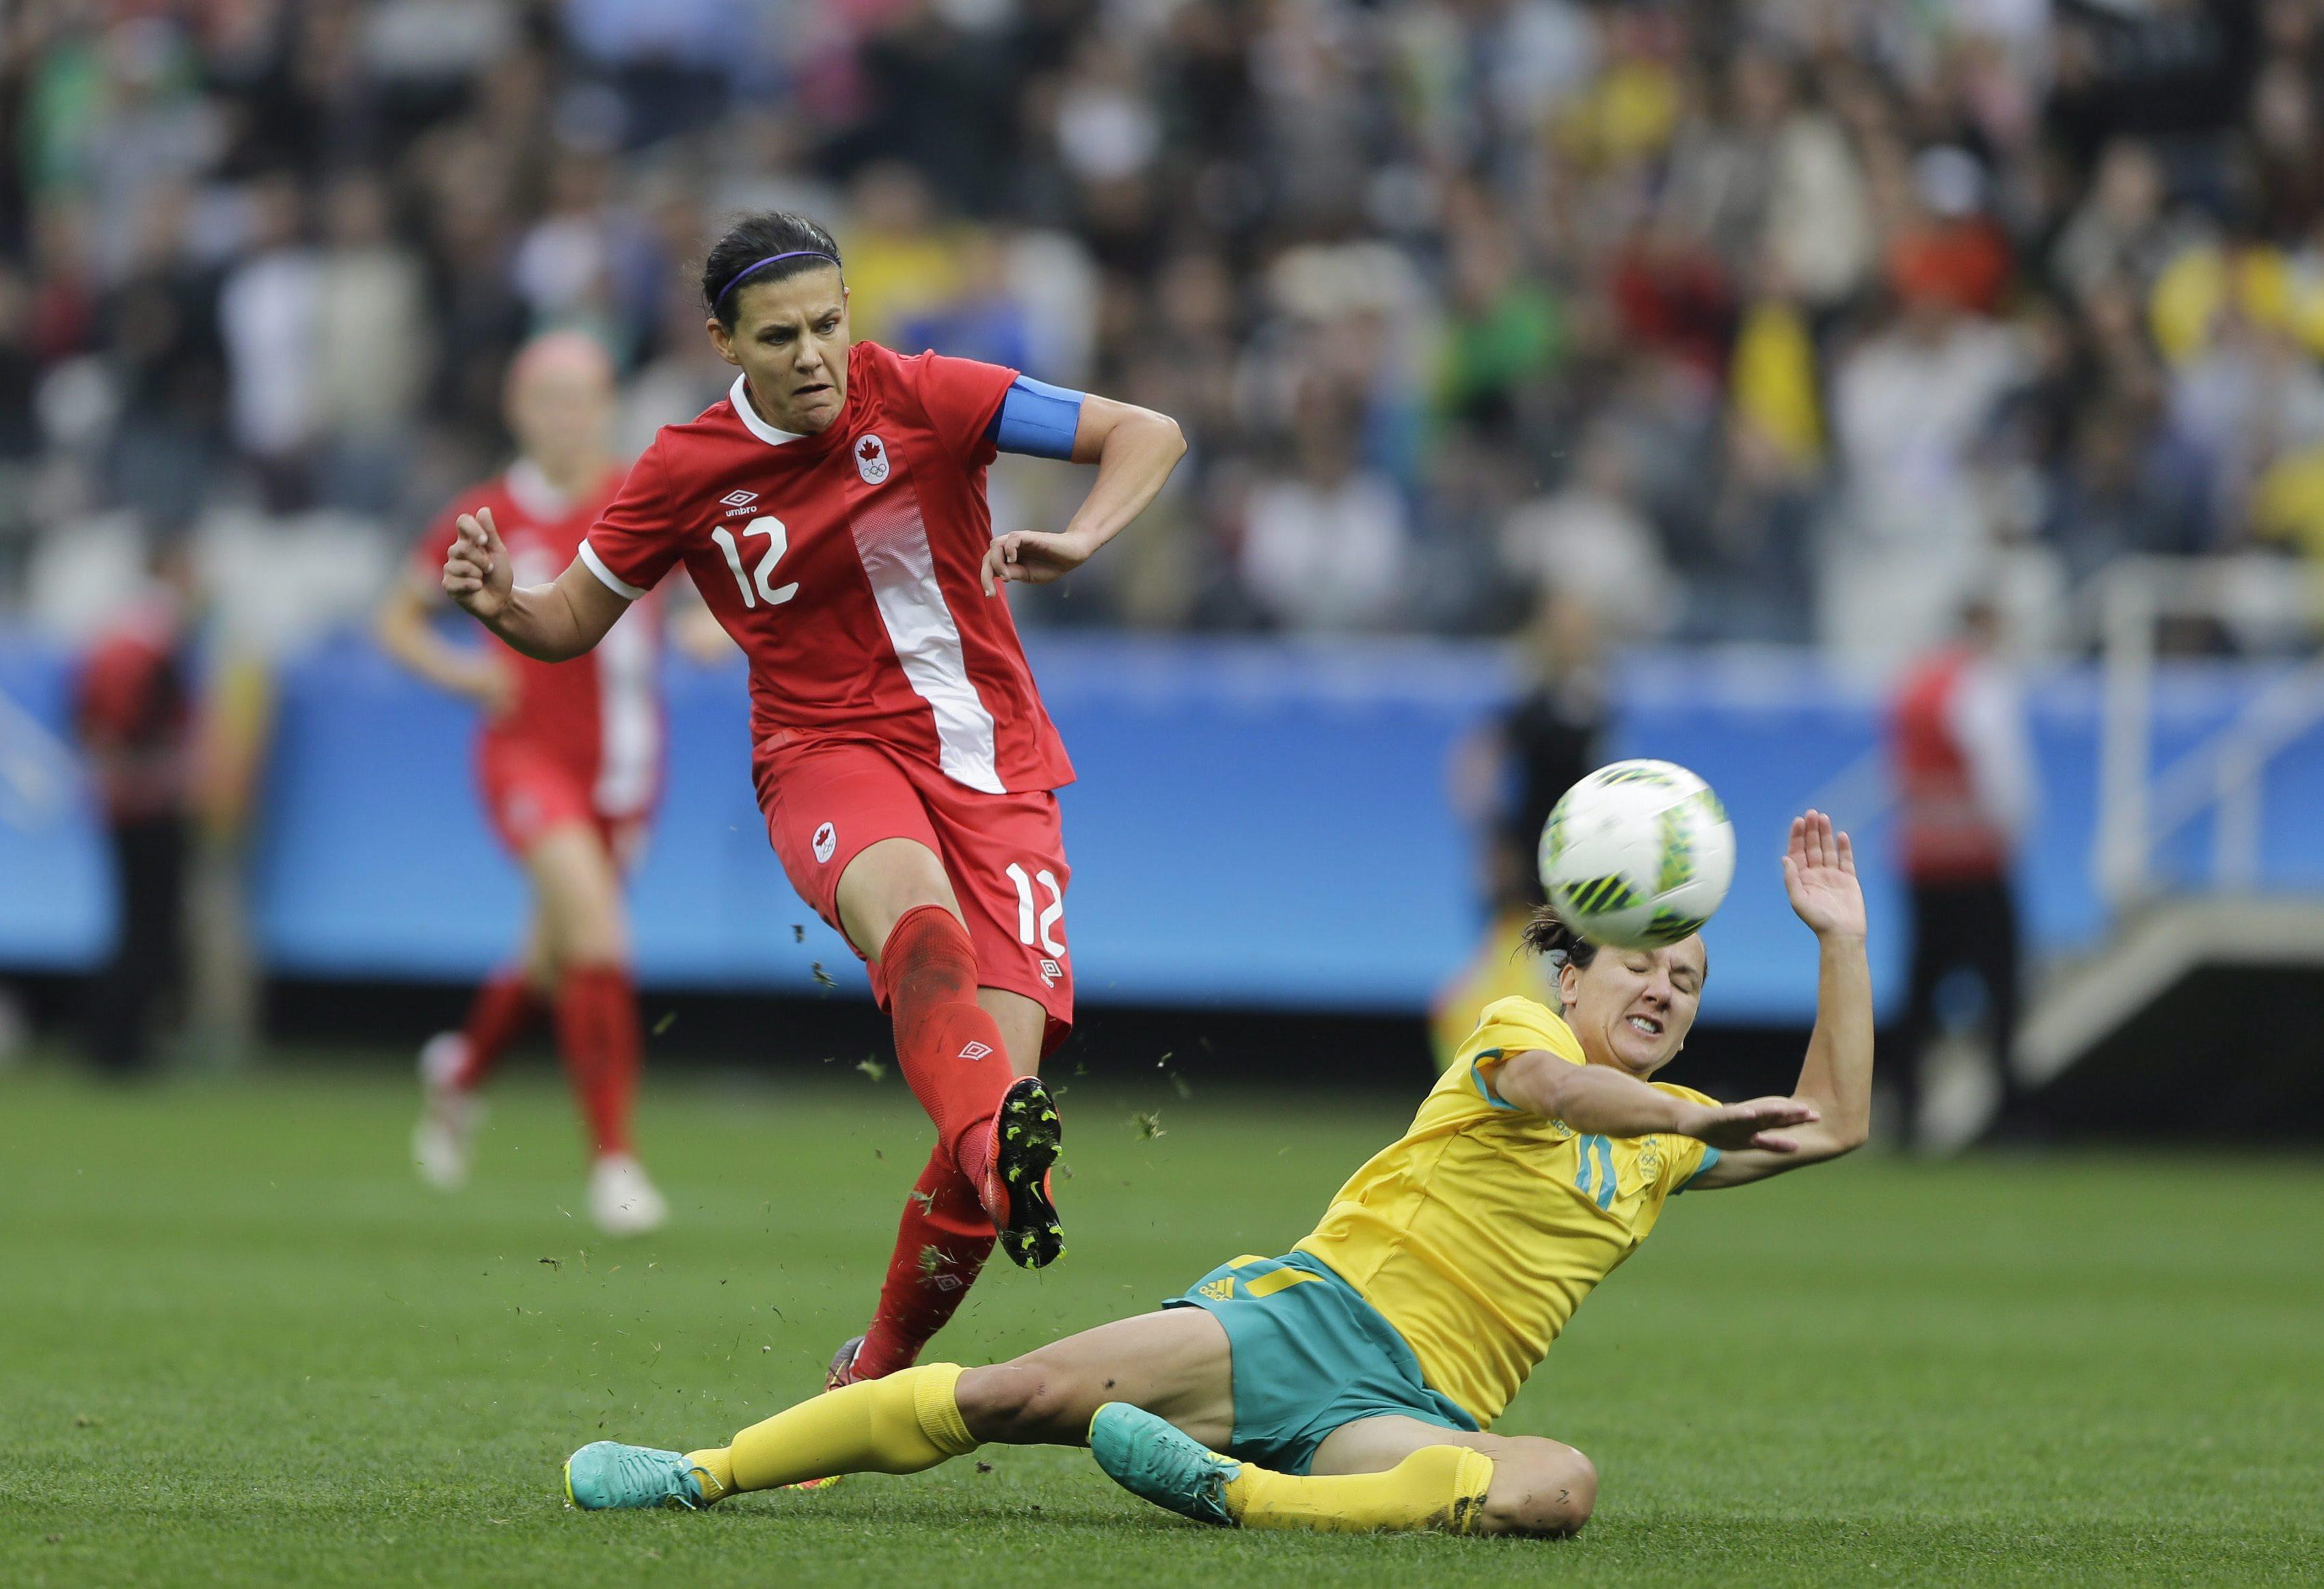 Christine Sinclair kicks the ball over a fallen Team Australian player.